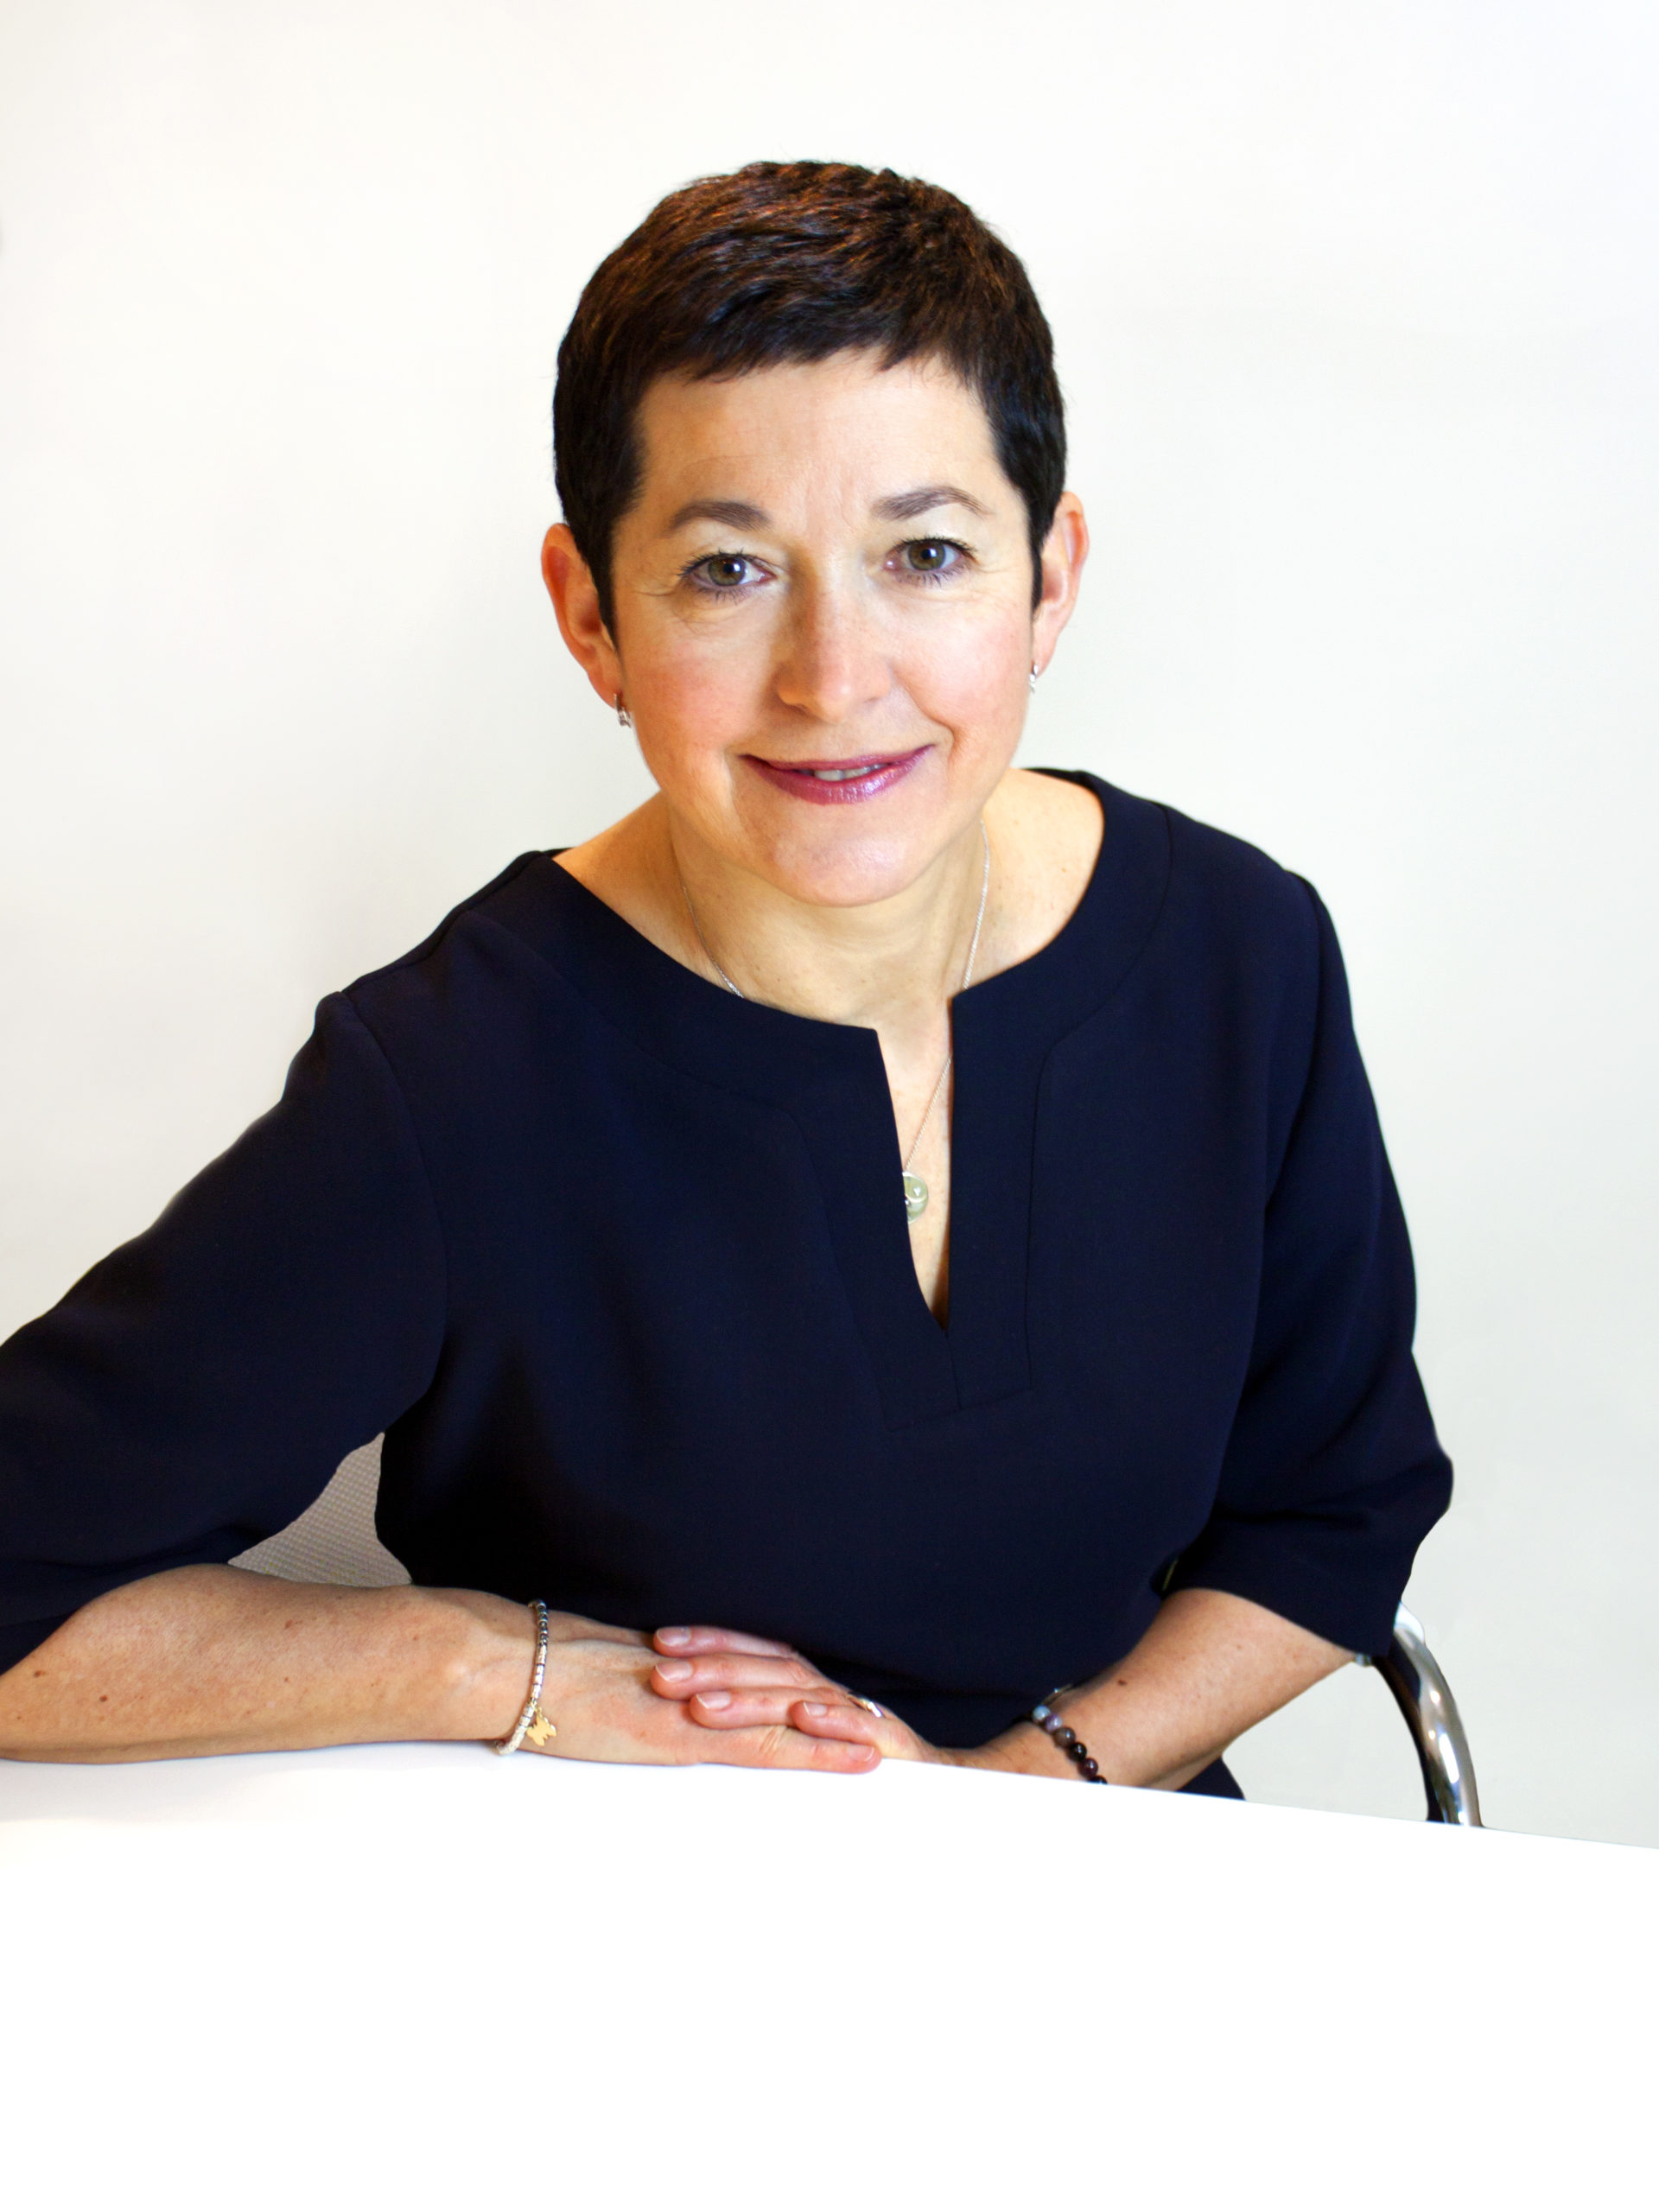 Nadine Coulm